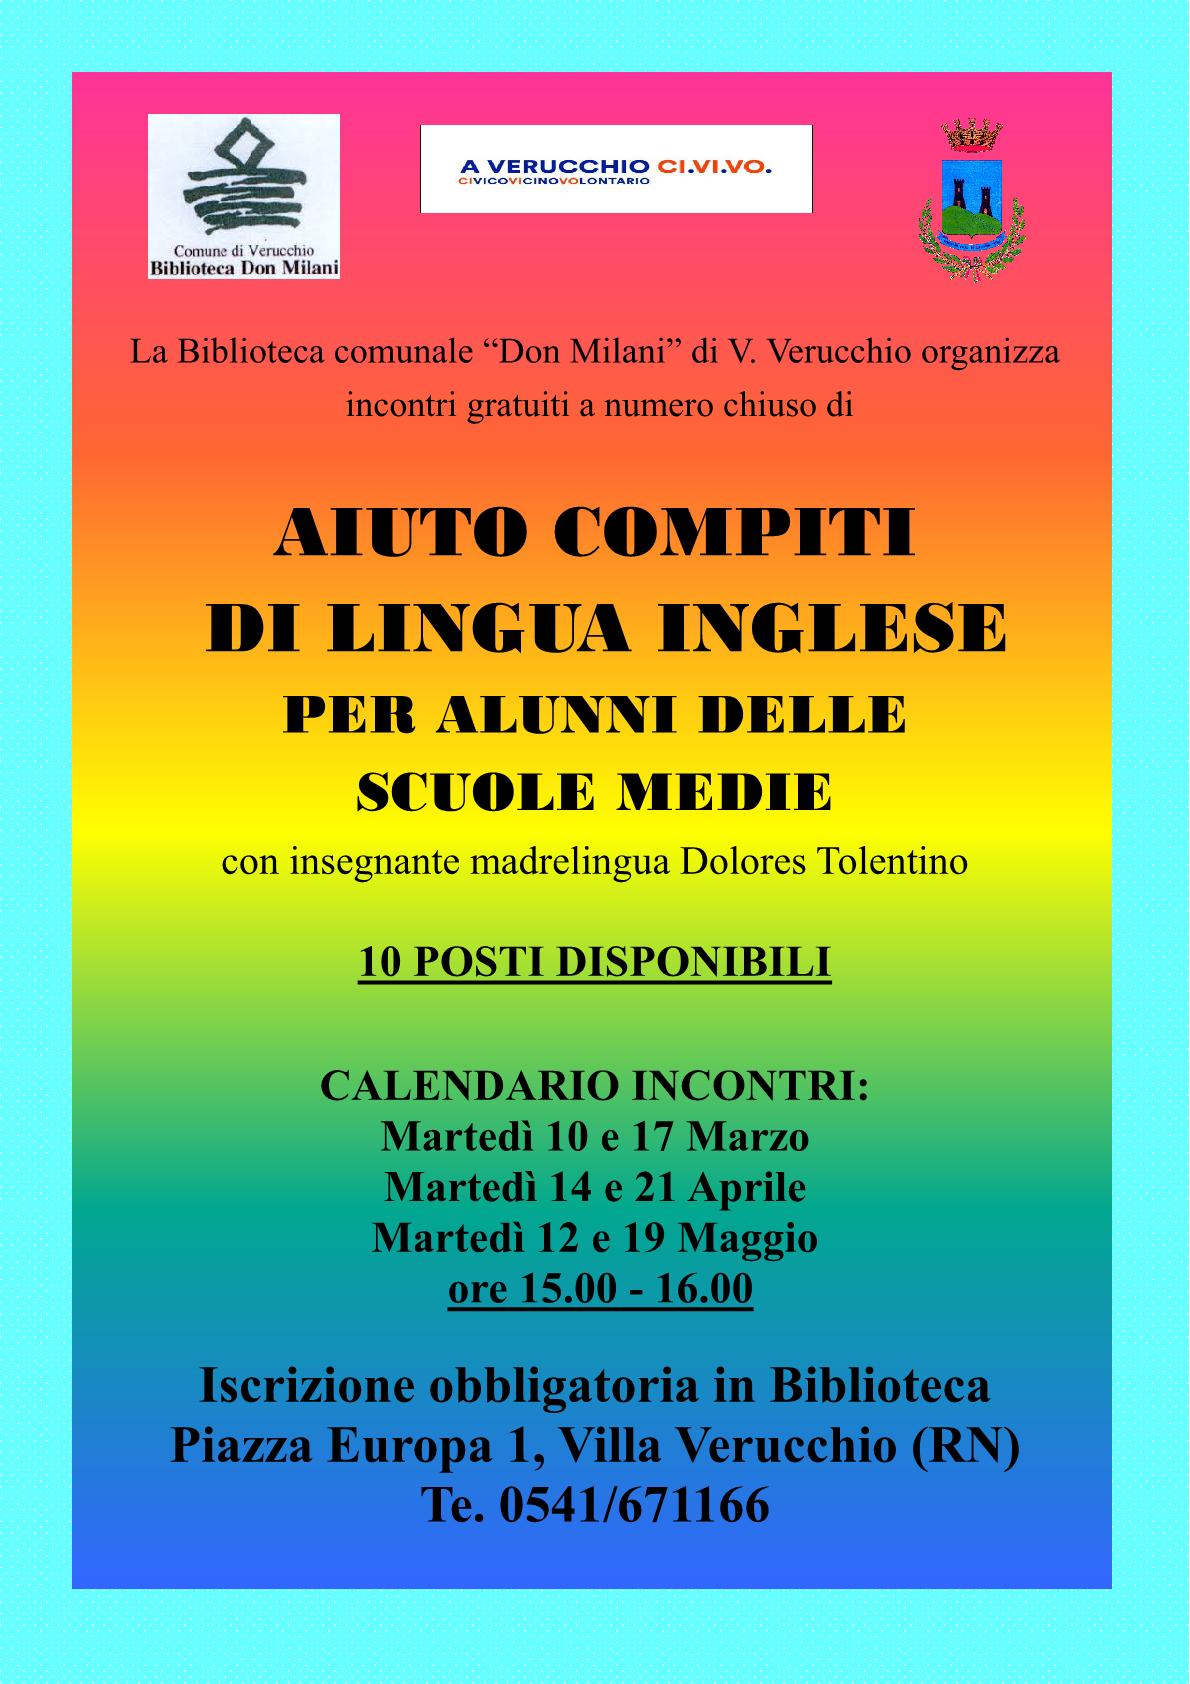 INGLESE AIUTO COMPITI 20201.png